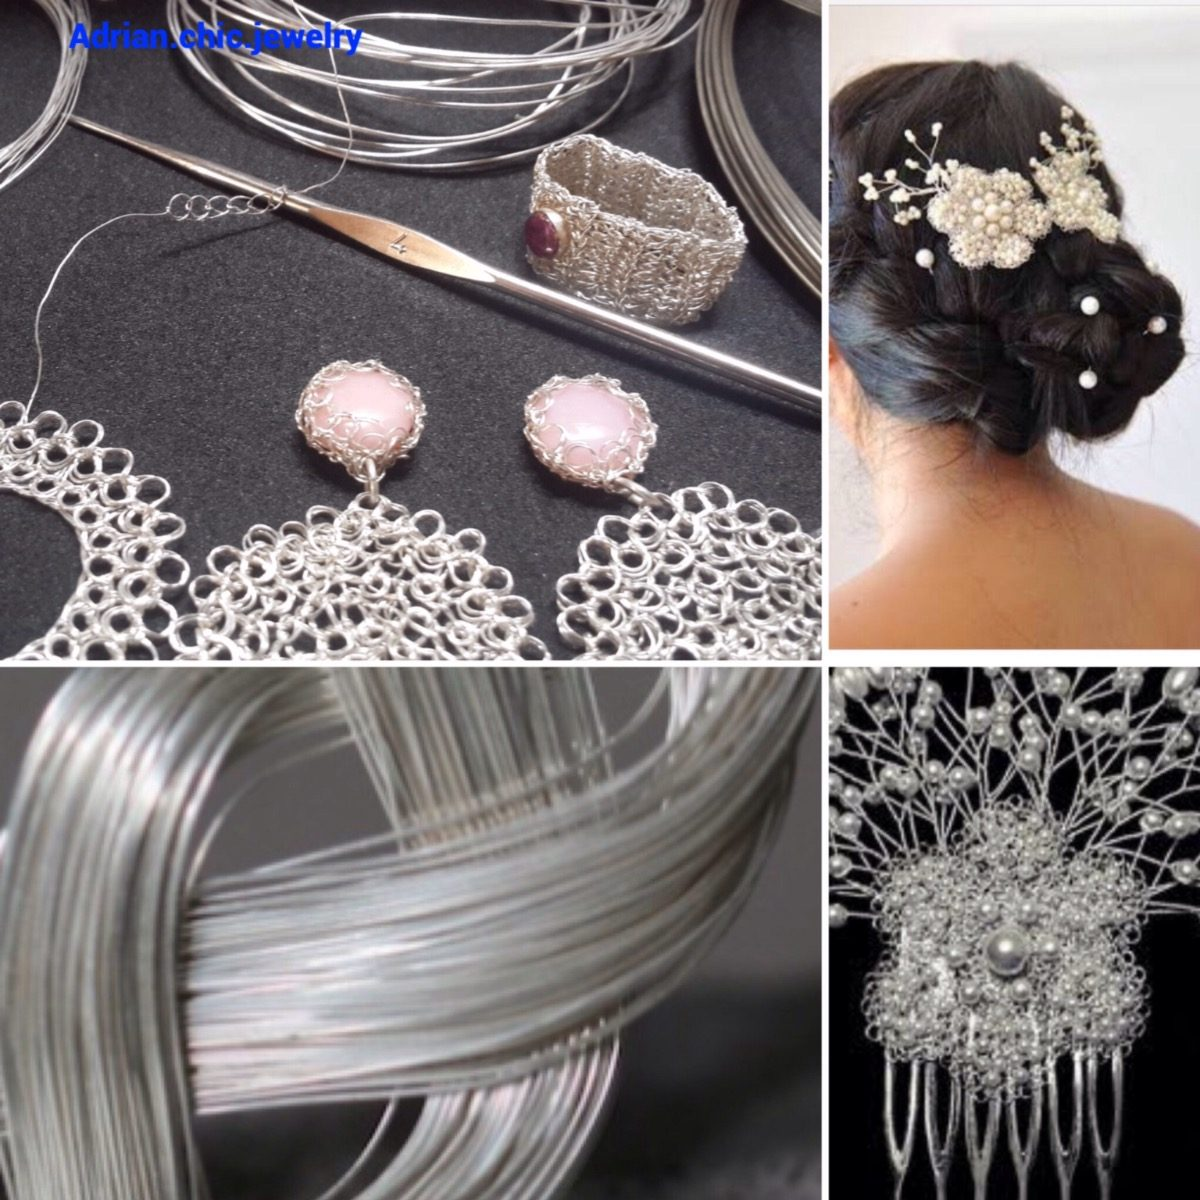 b912f9b853c4 manualidades bisuteria materiales plata hilos cintas lamina. Cargando zoom.